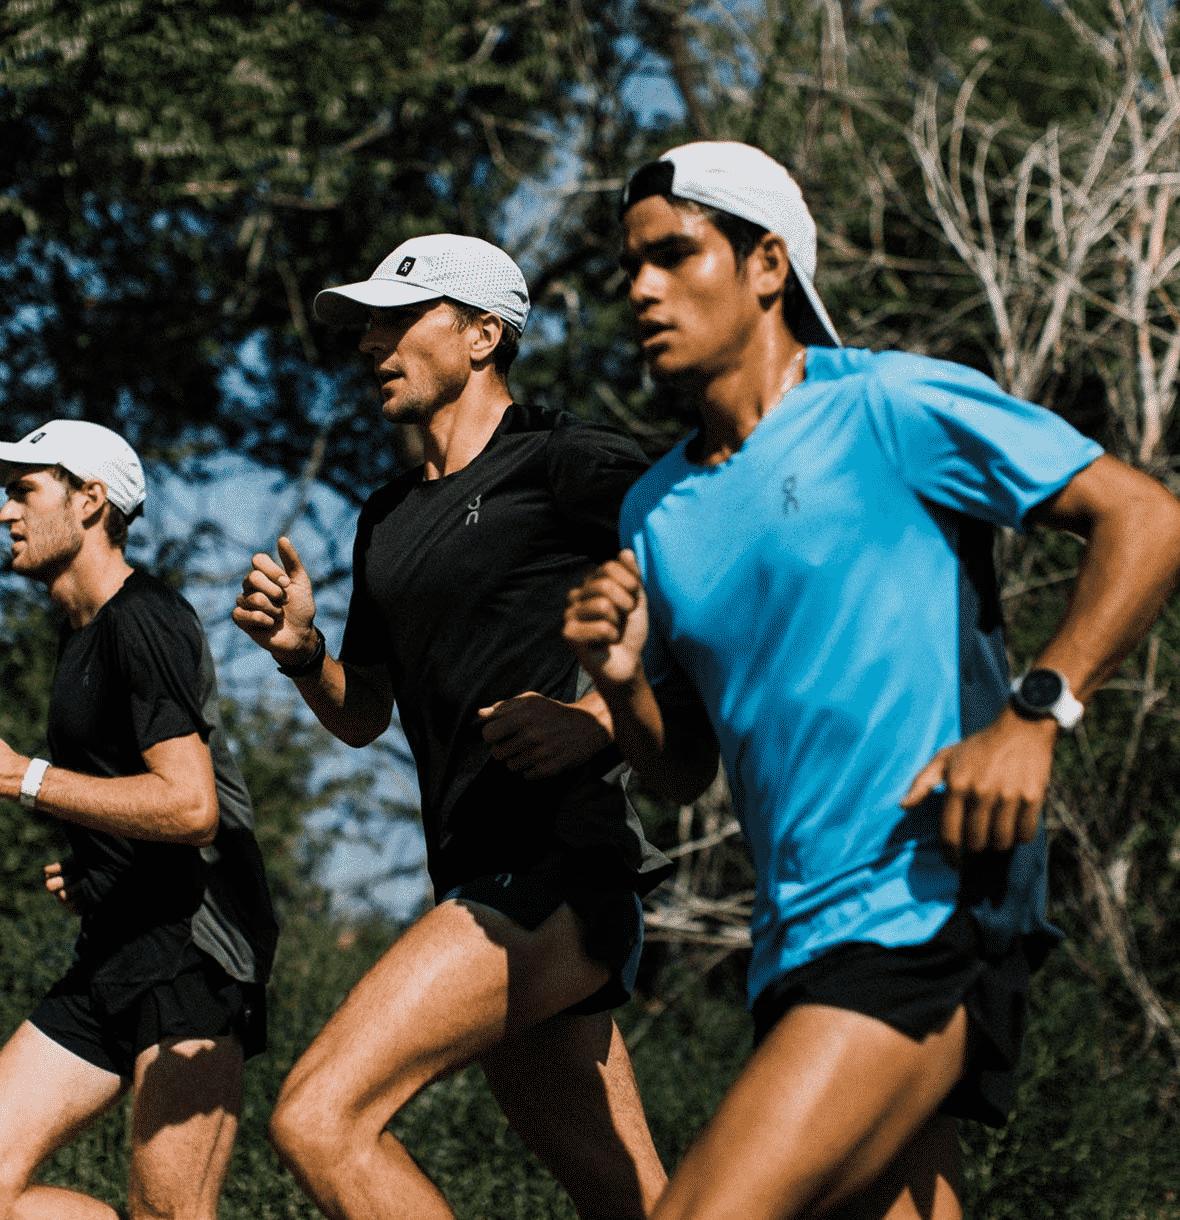 OAC_On_Athletics_Club_Running_2